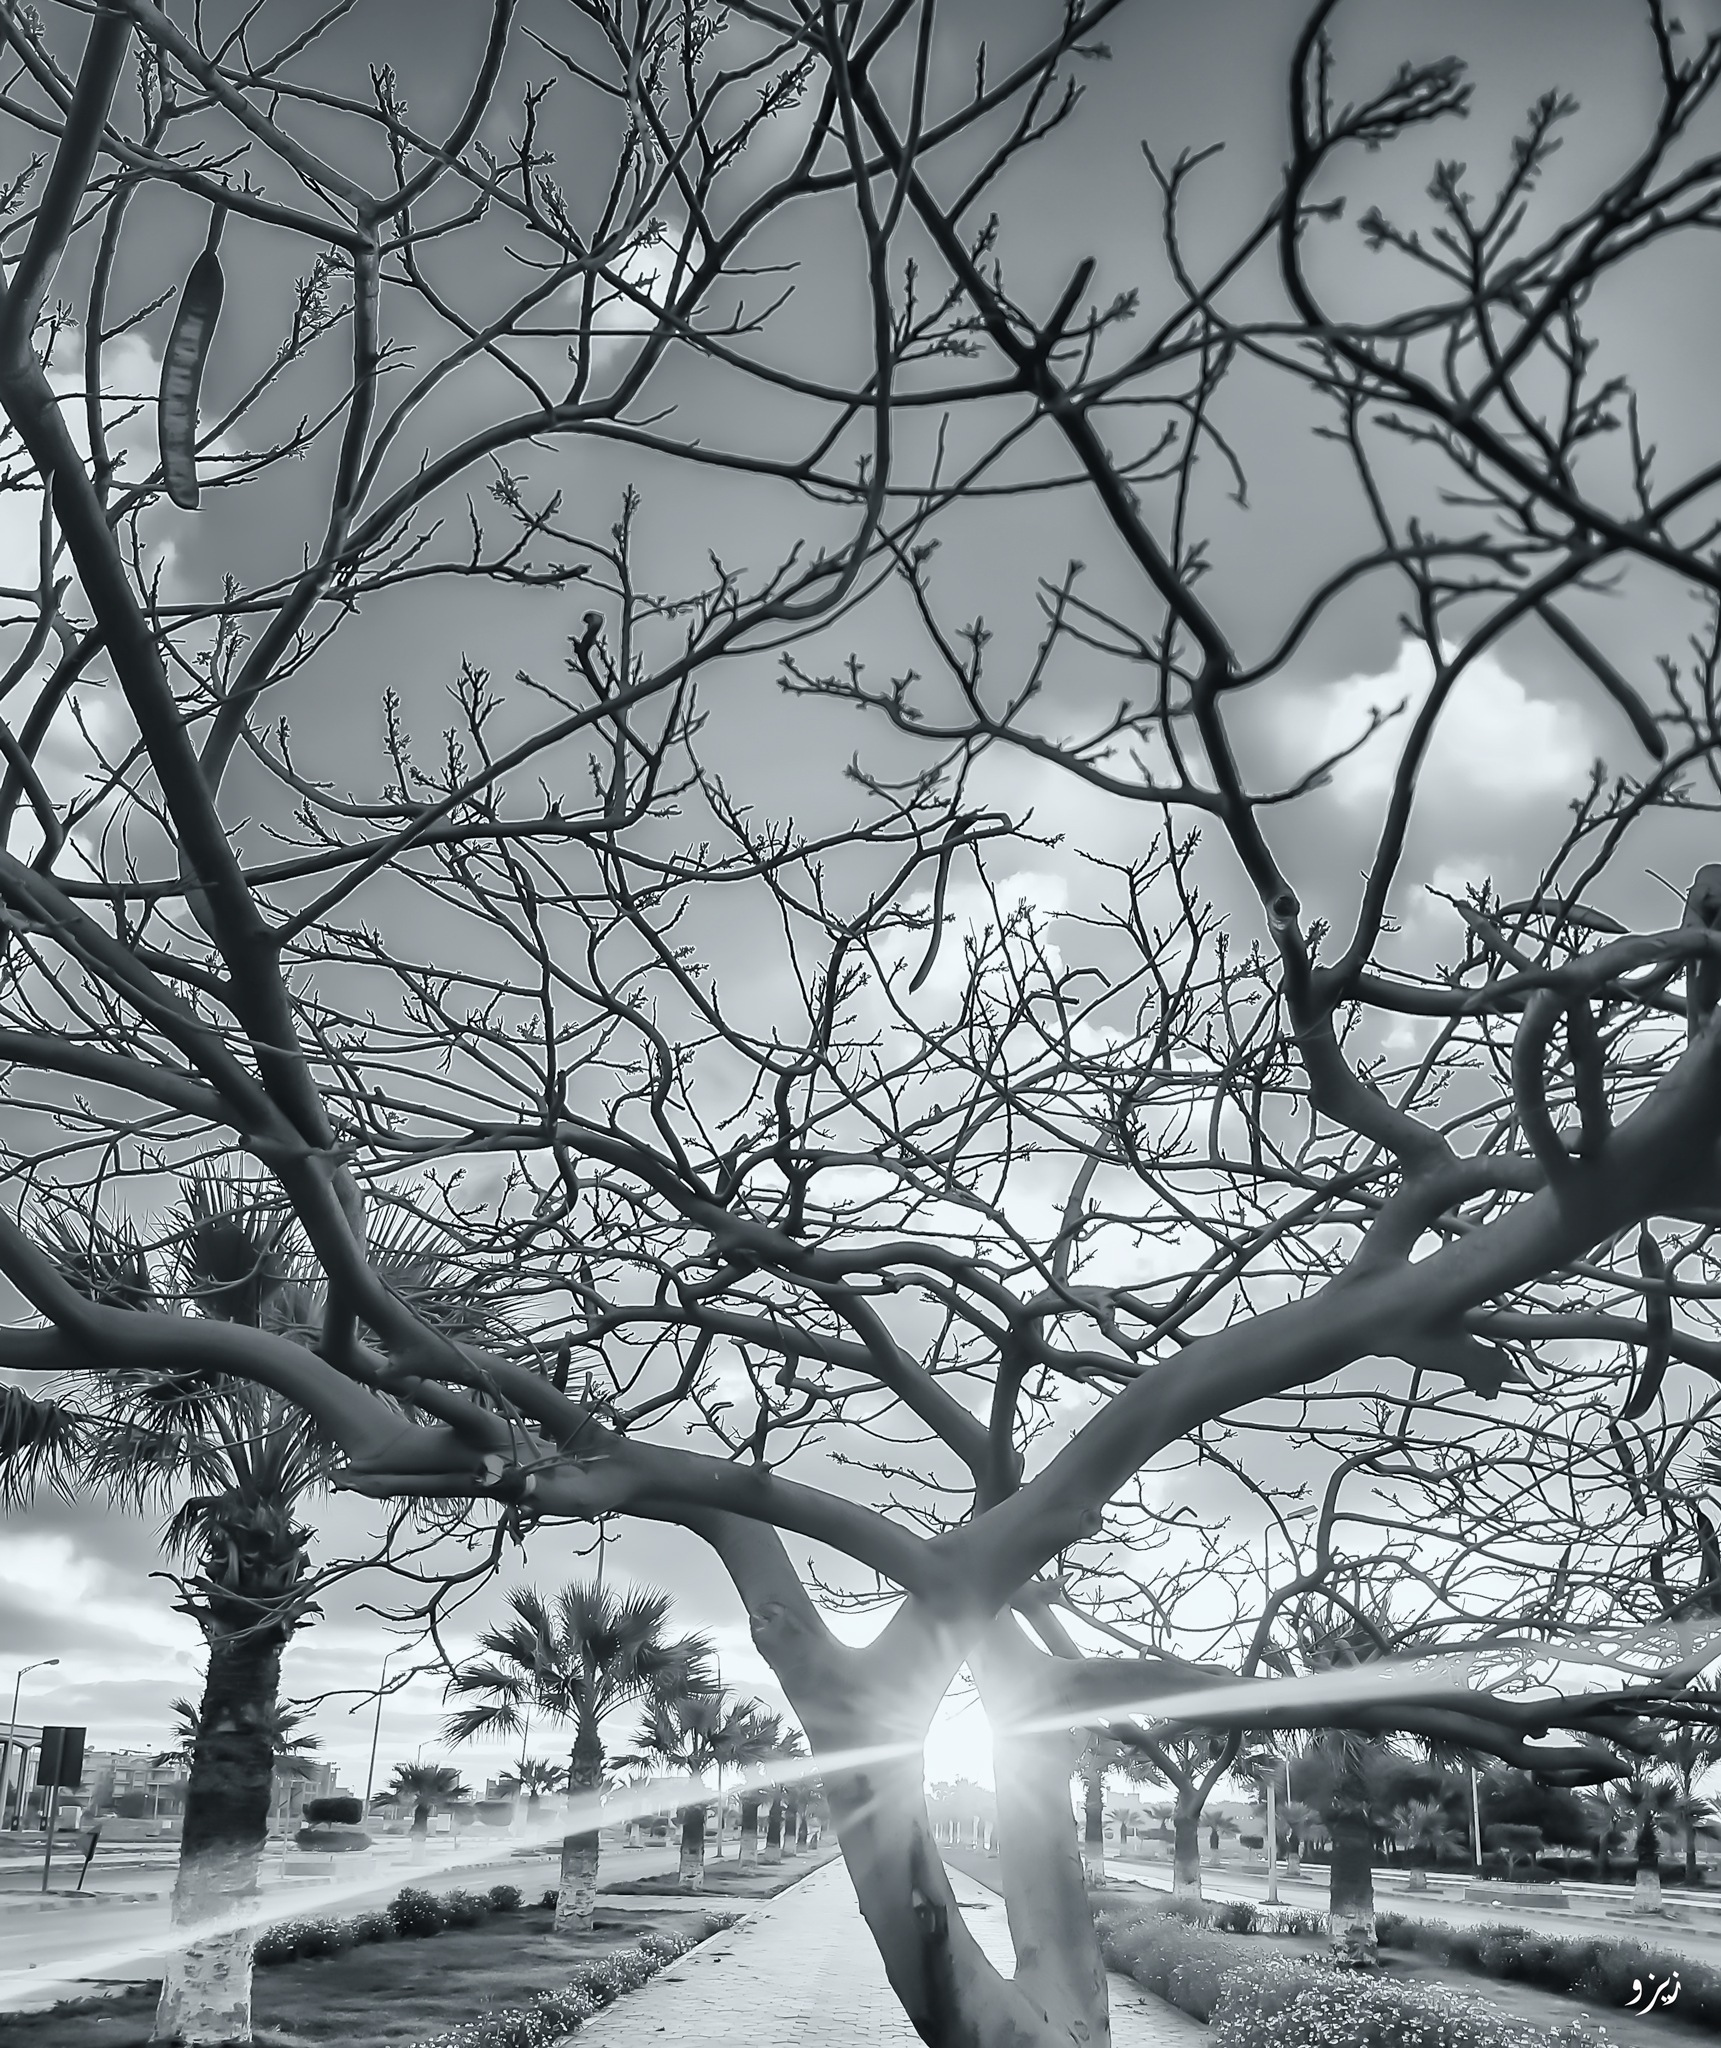 Untitled by Abdulaziz Seddik